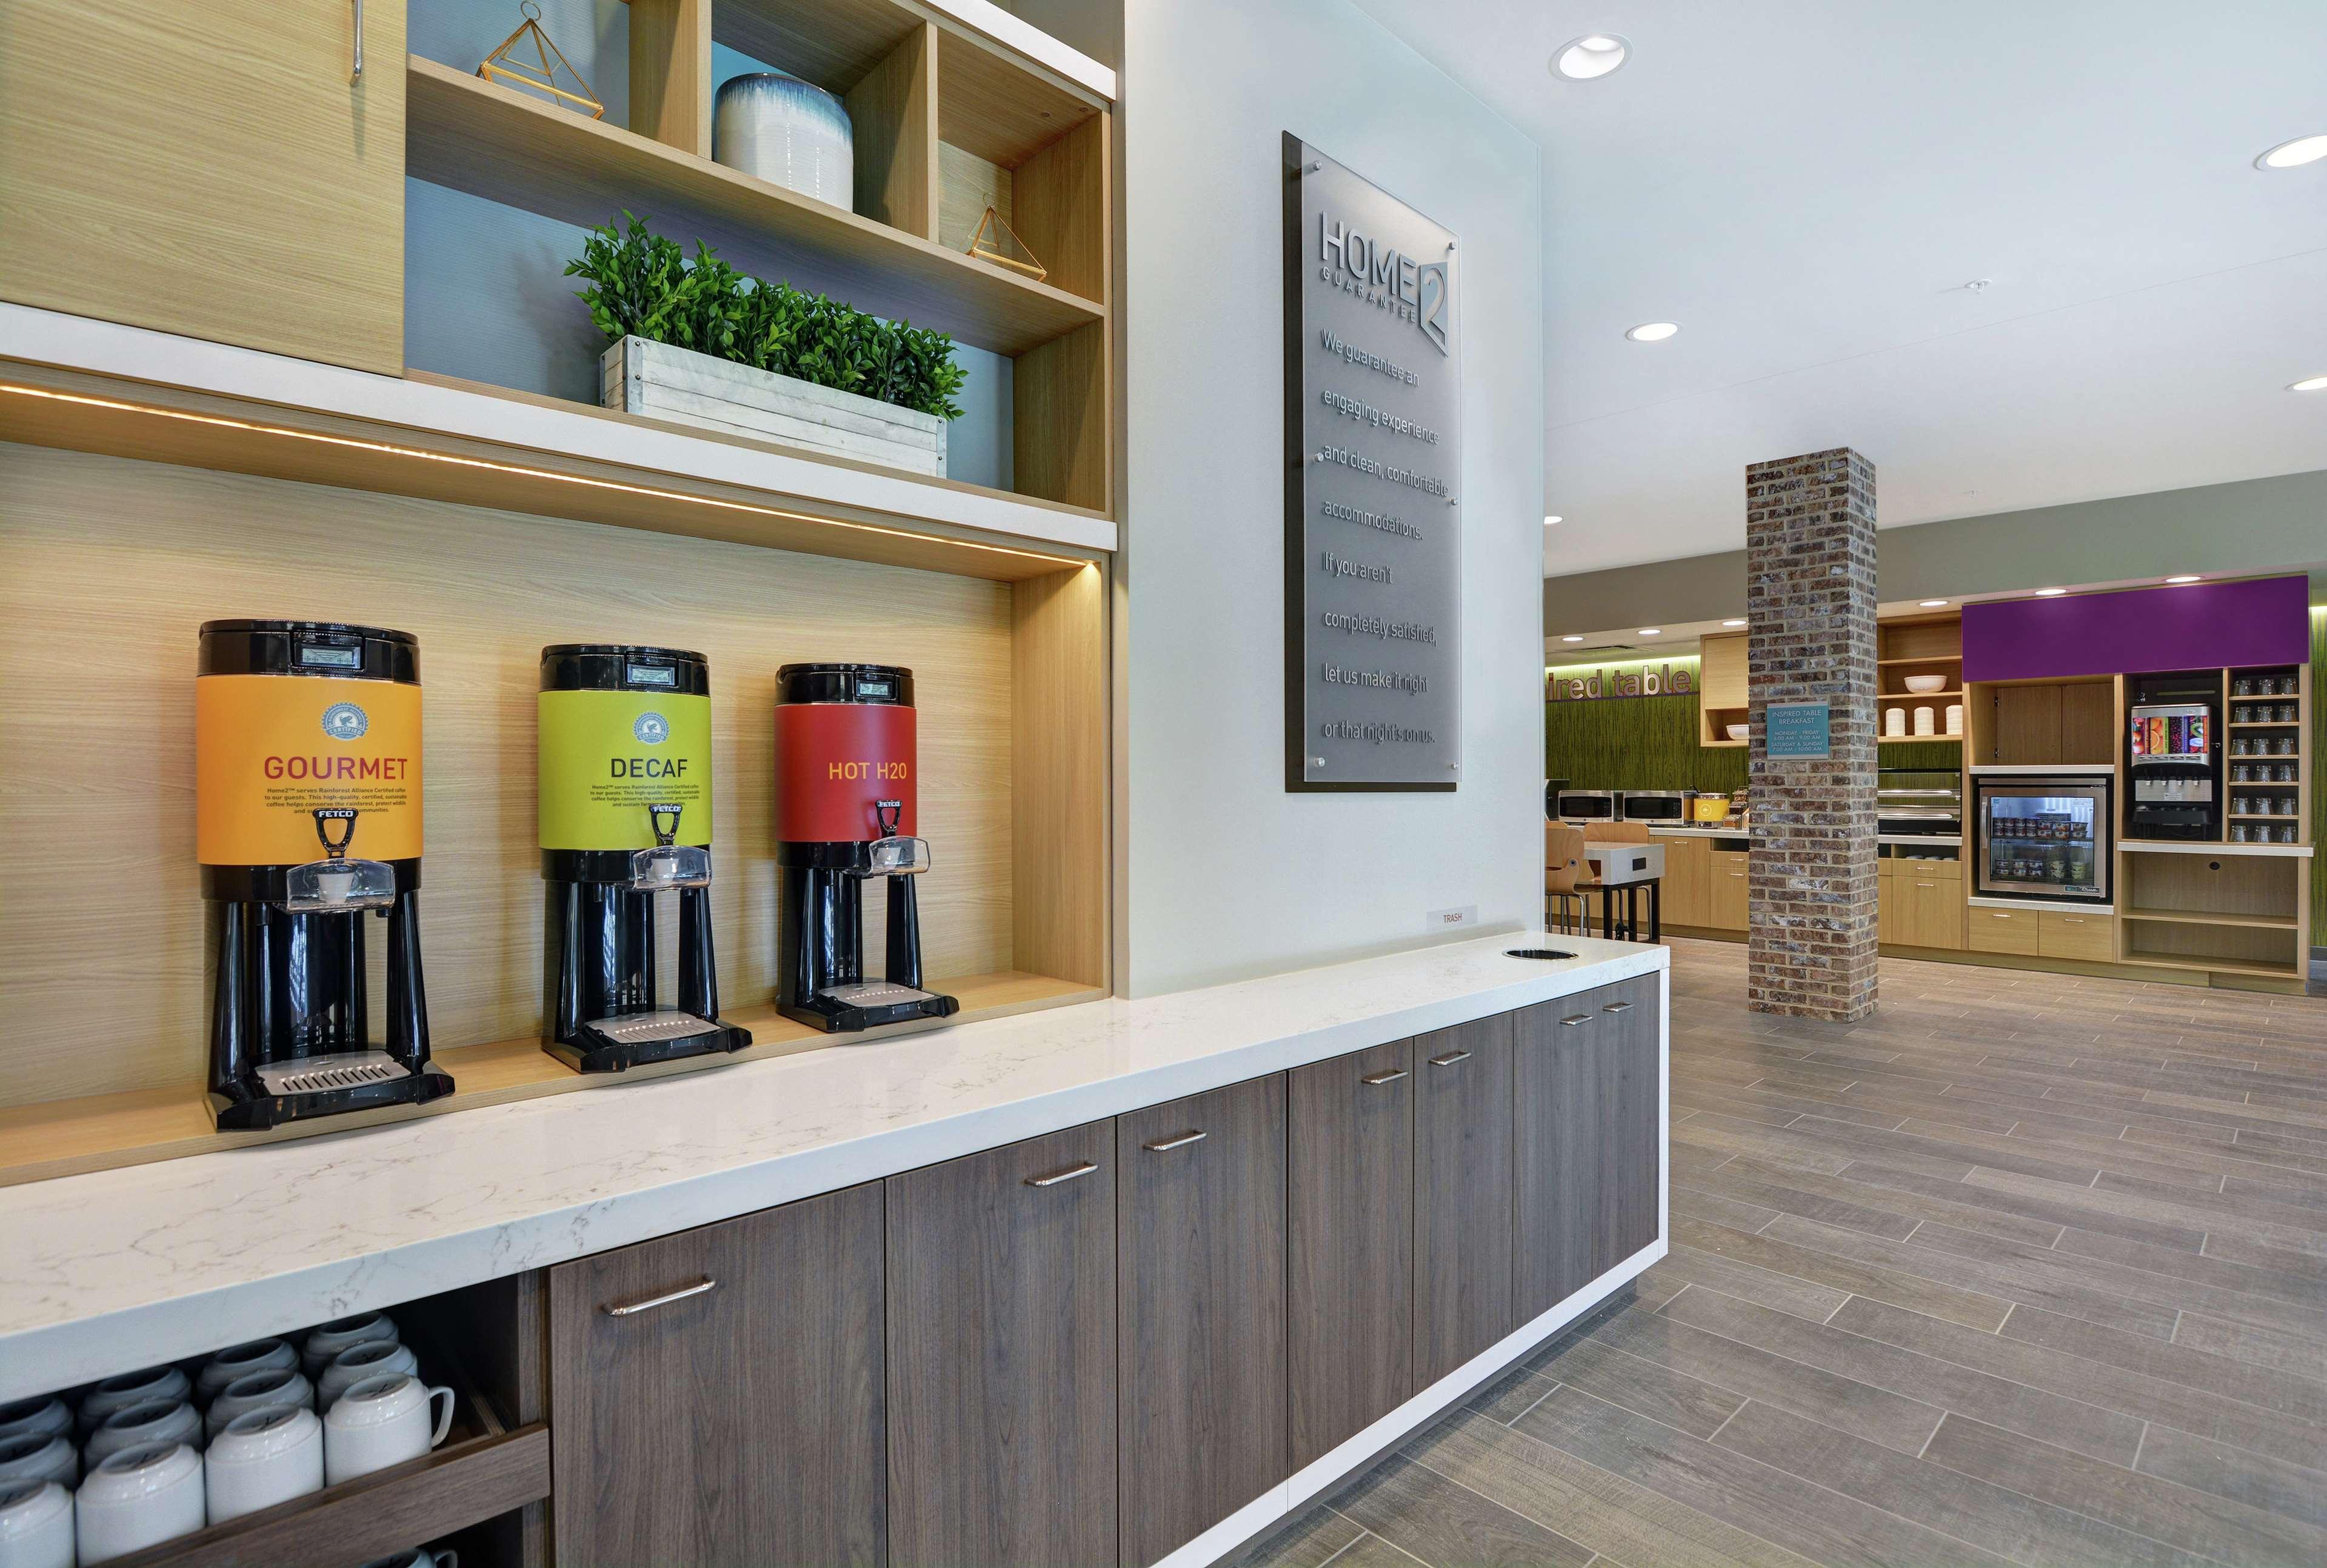 Home2 Suites by Hilton Charleston Daniel Island